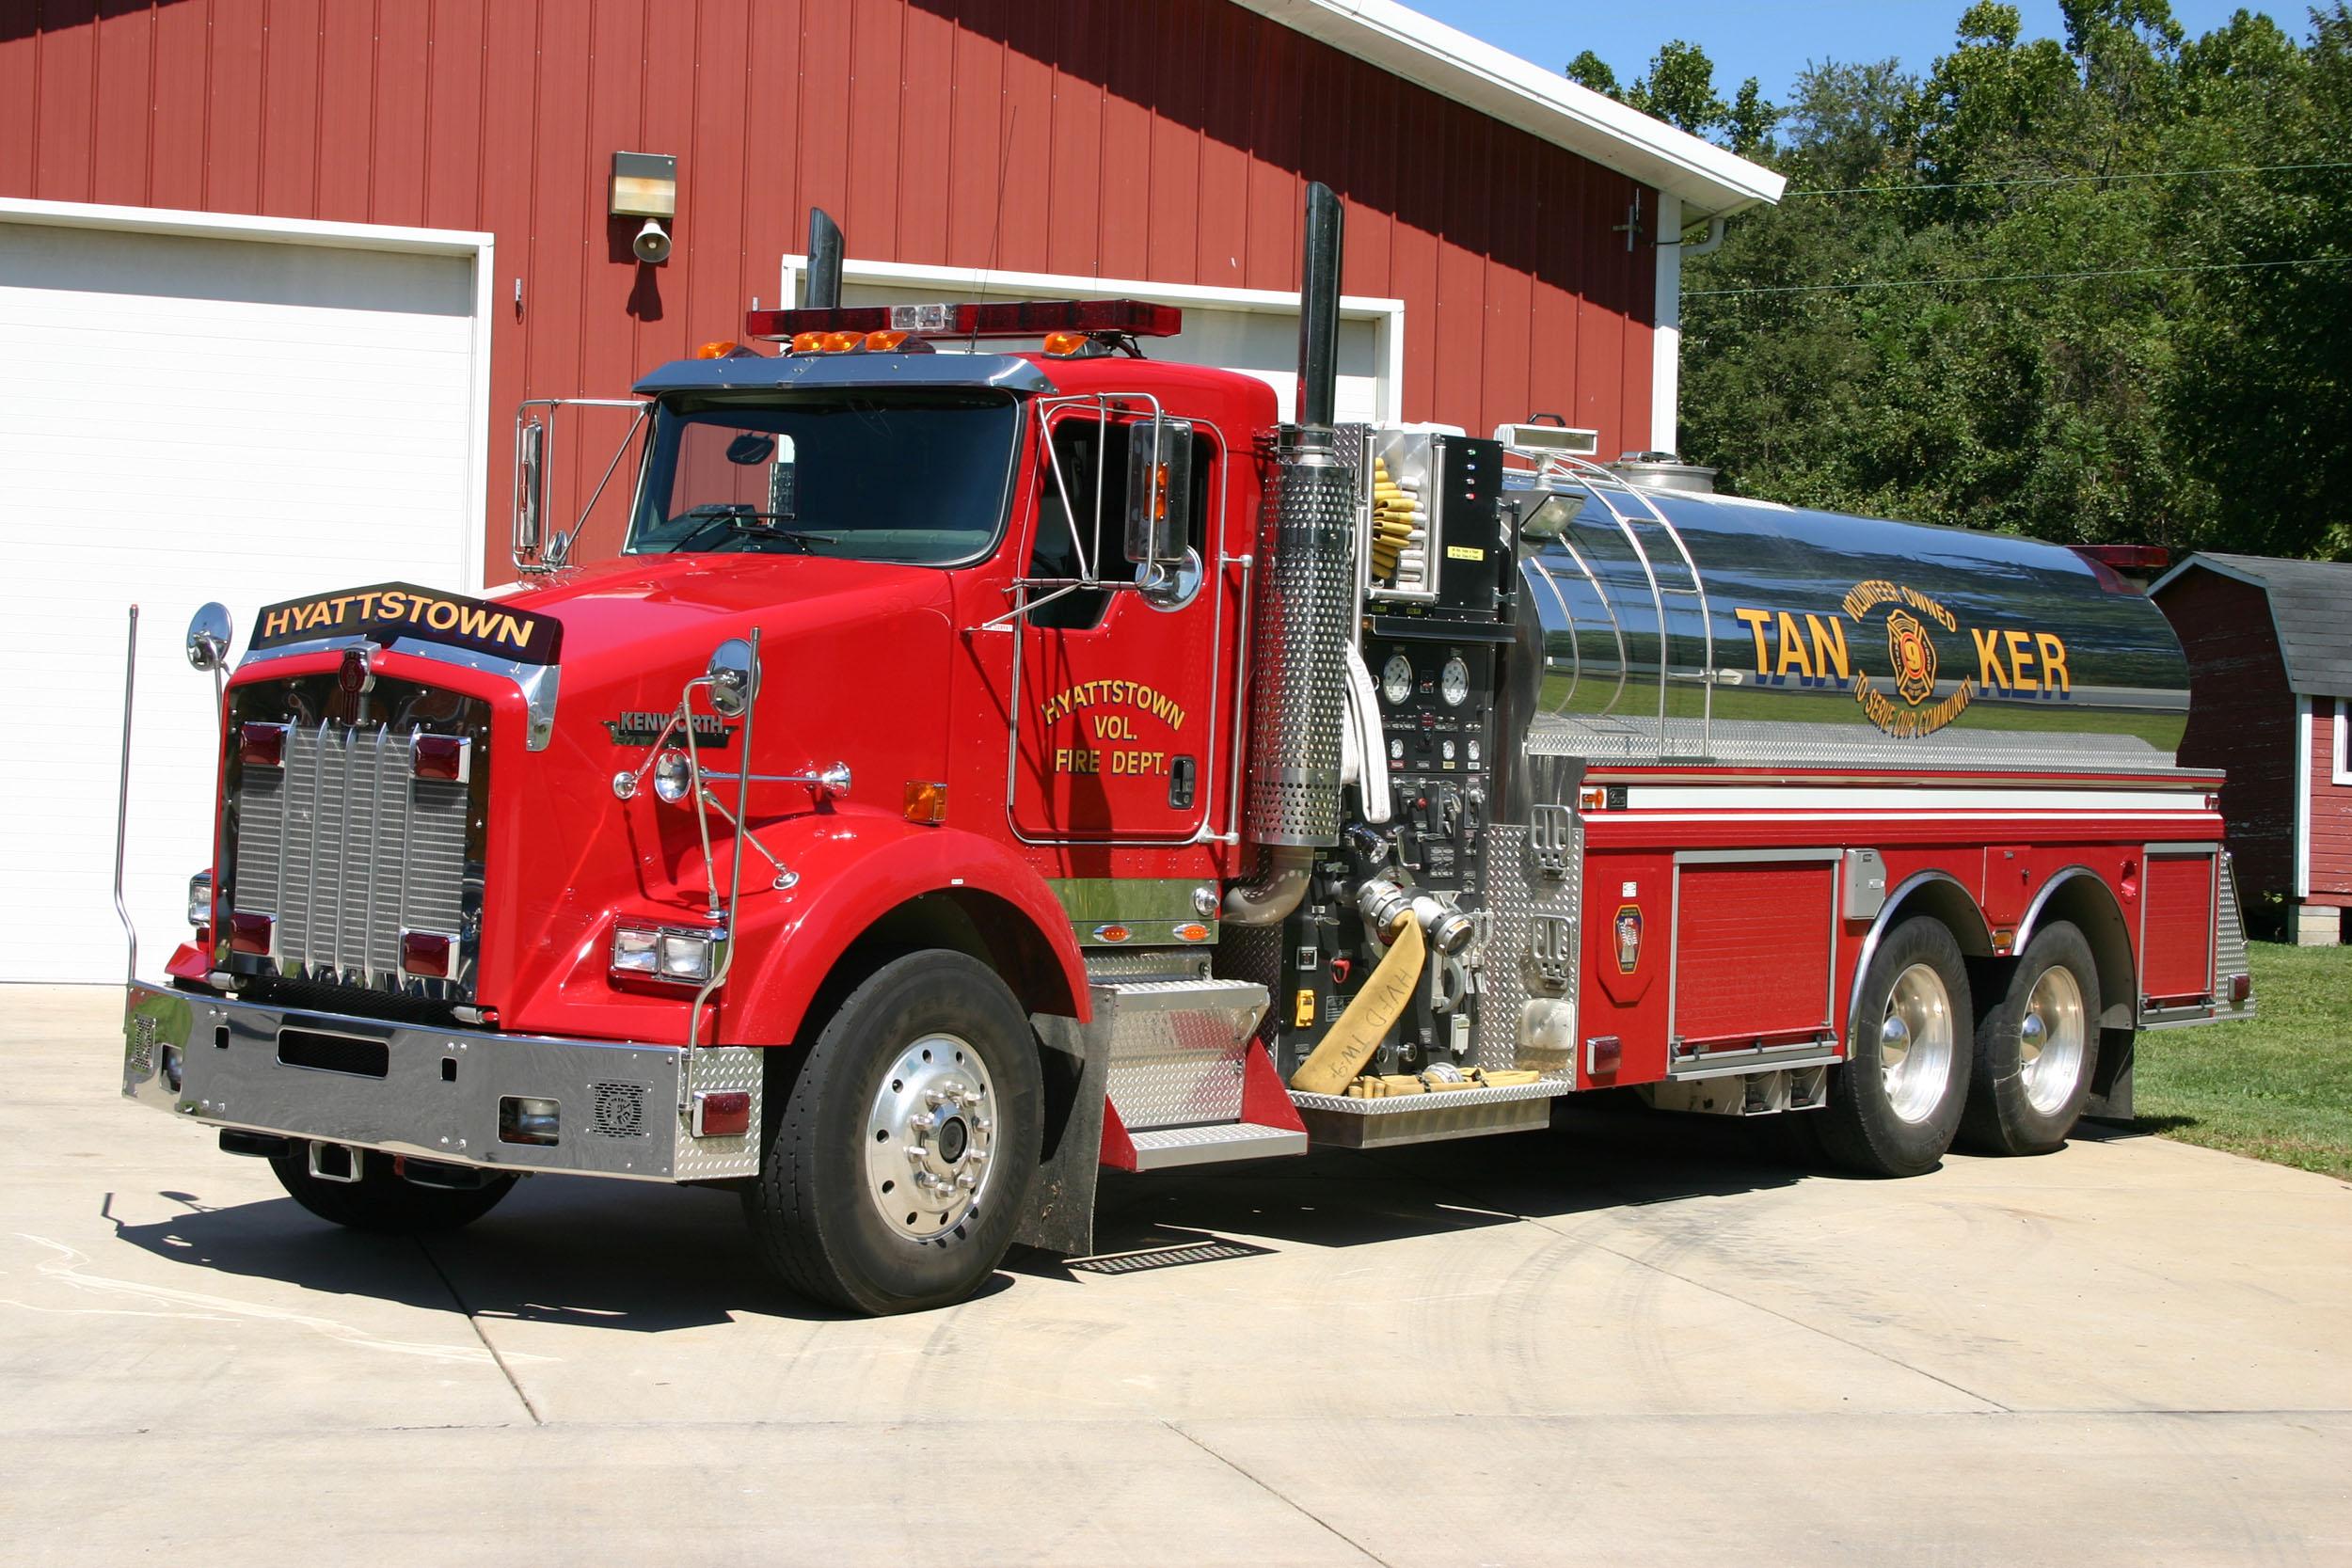 Tanker 709